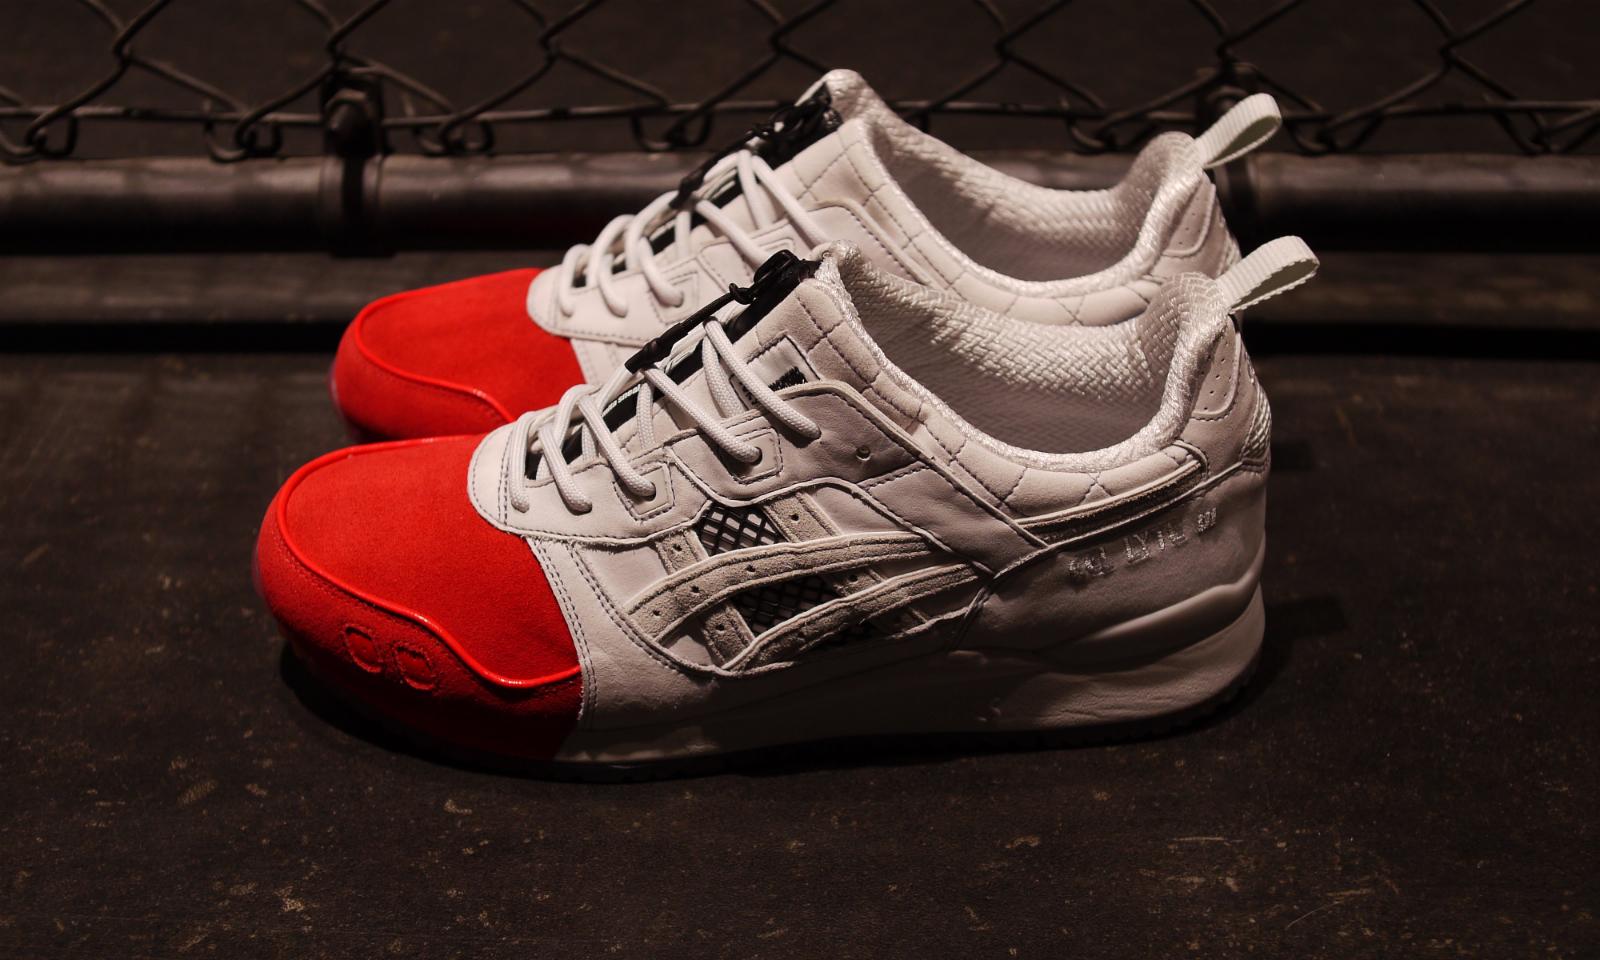 ASICS 与日本球鞋名所 Mita Sneakers 推出全新联名企划